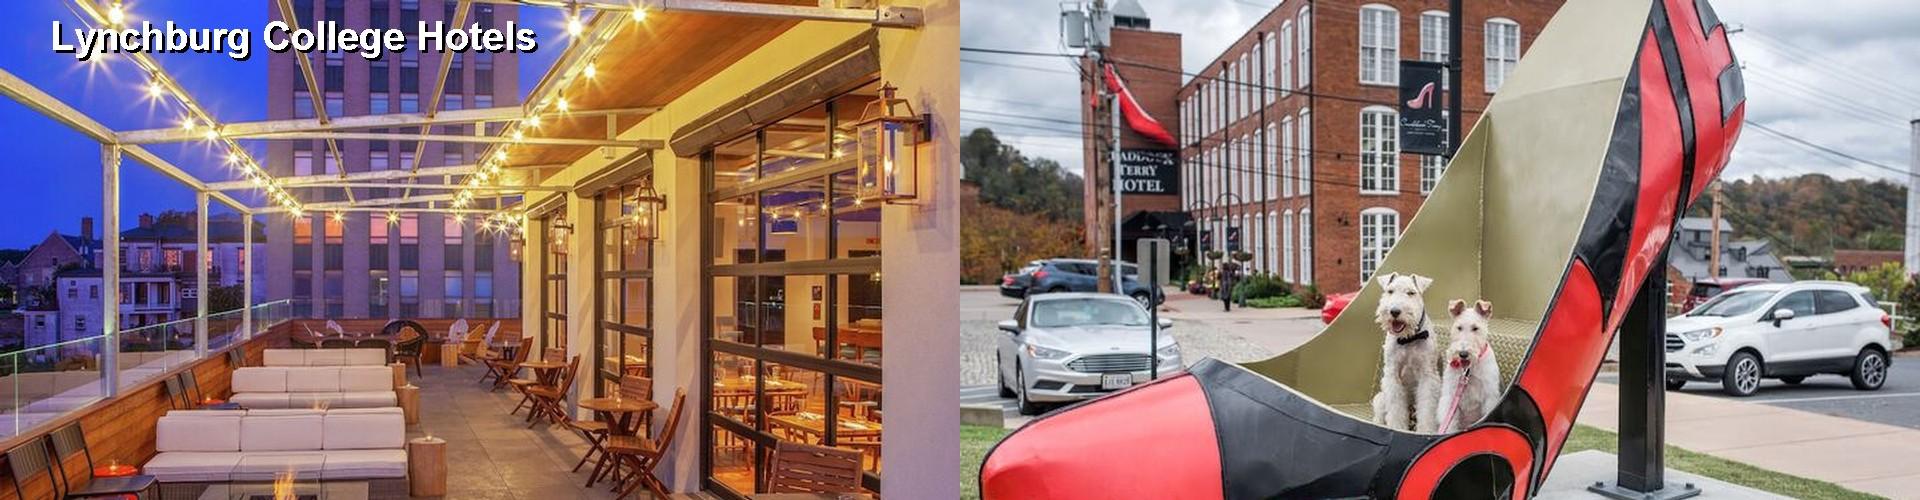 5 Best Hotels Near Lynchburg College